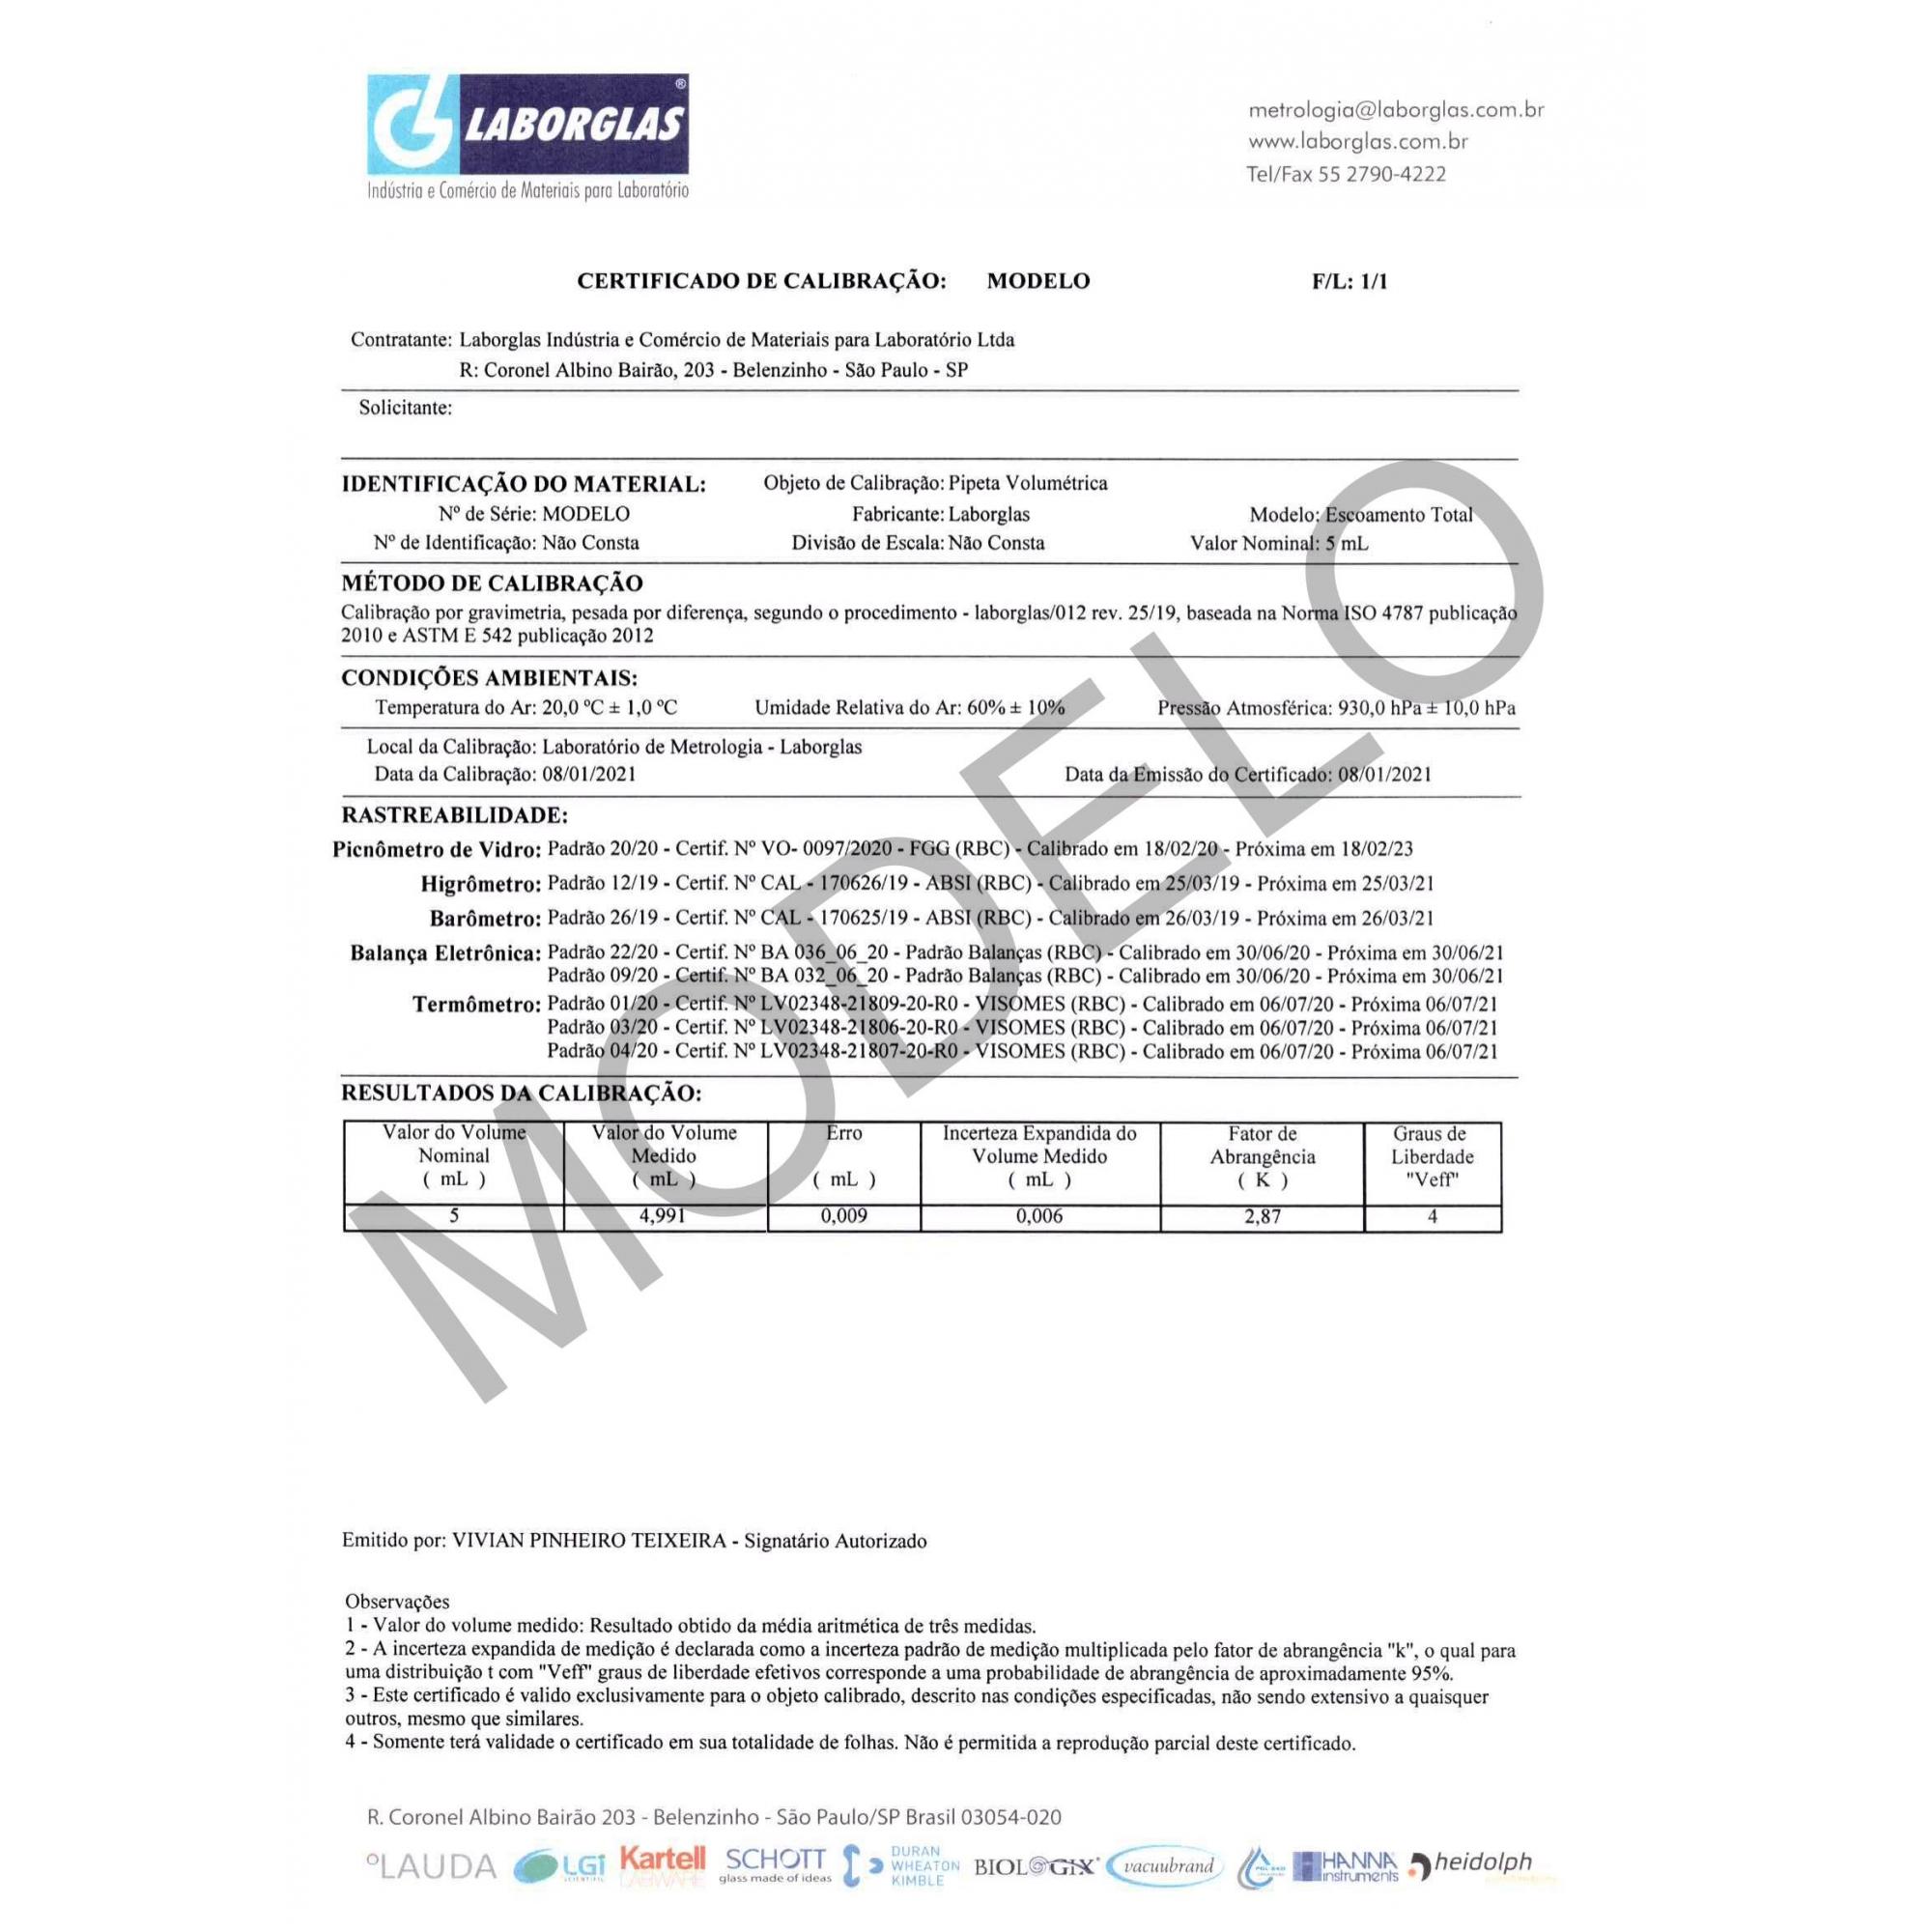 PIPETA VOLUMÉTRICA  ESGOTAMENTO TOTAL CLASSE A  1 ML COM CERTIFICADO RASTREÁVEL - Laborglas - Cód. 9433802-C